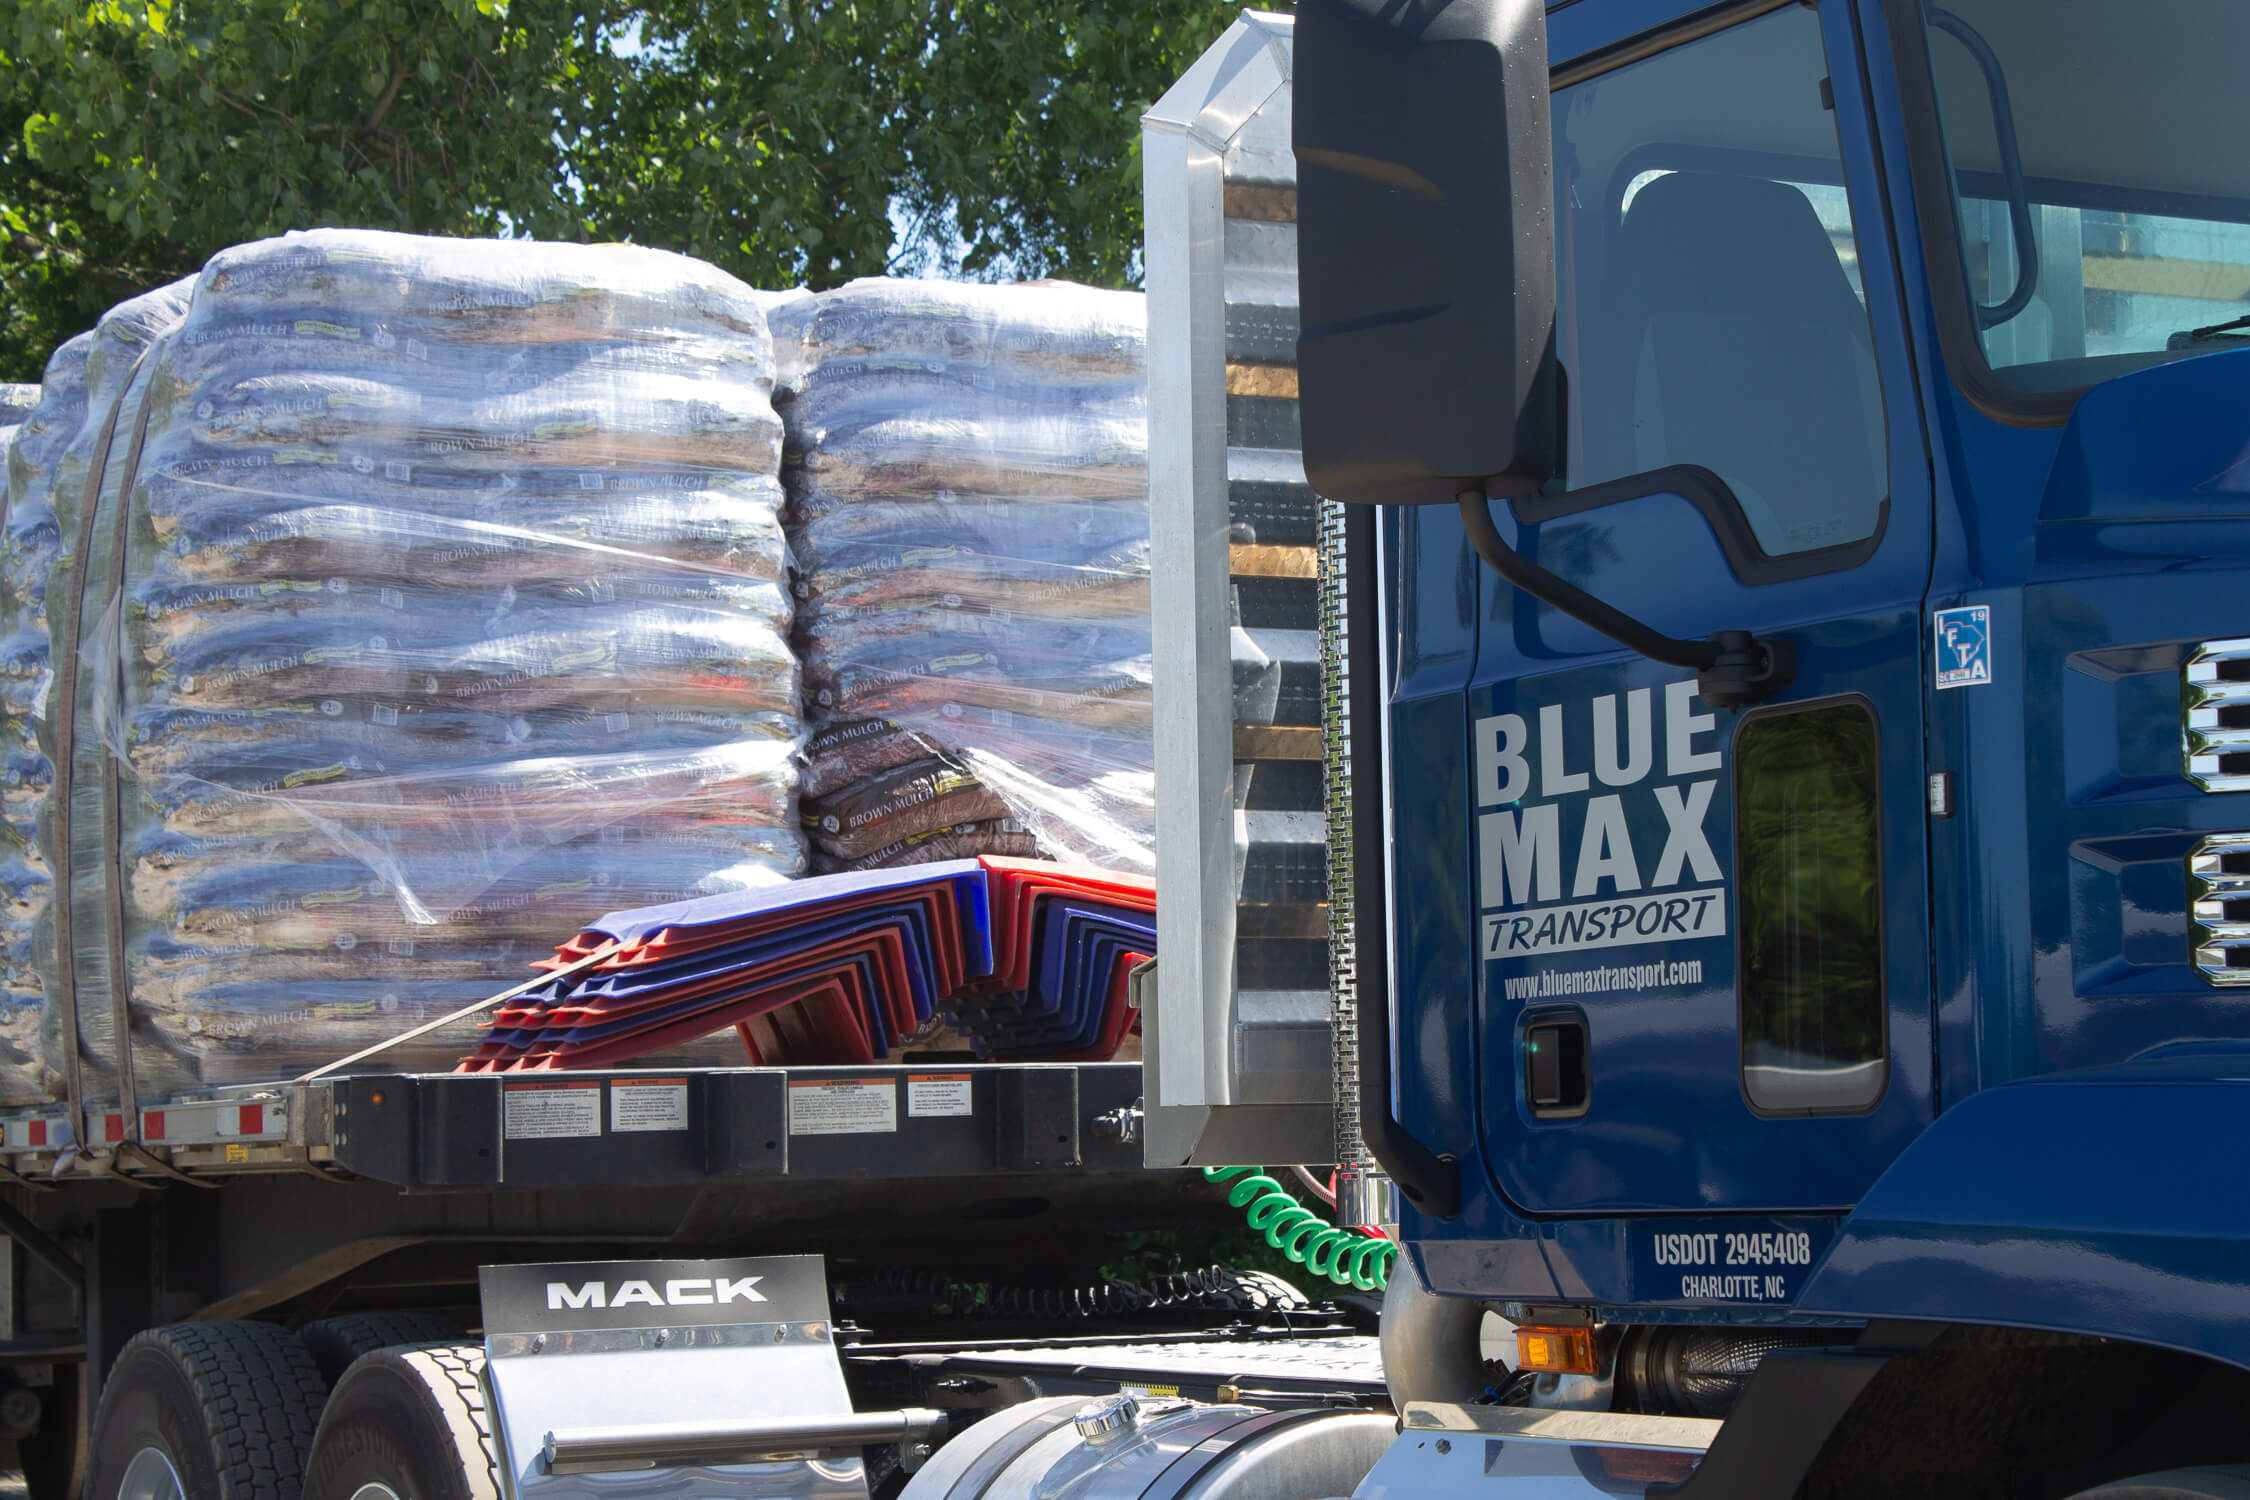 Blue Max Transport Truck Driving Jobs Transportation Services